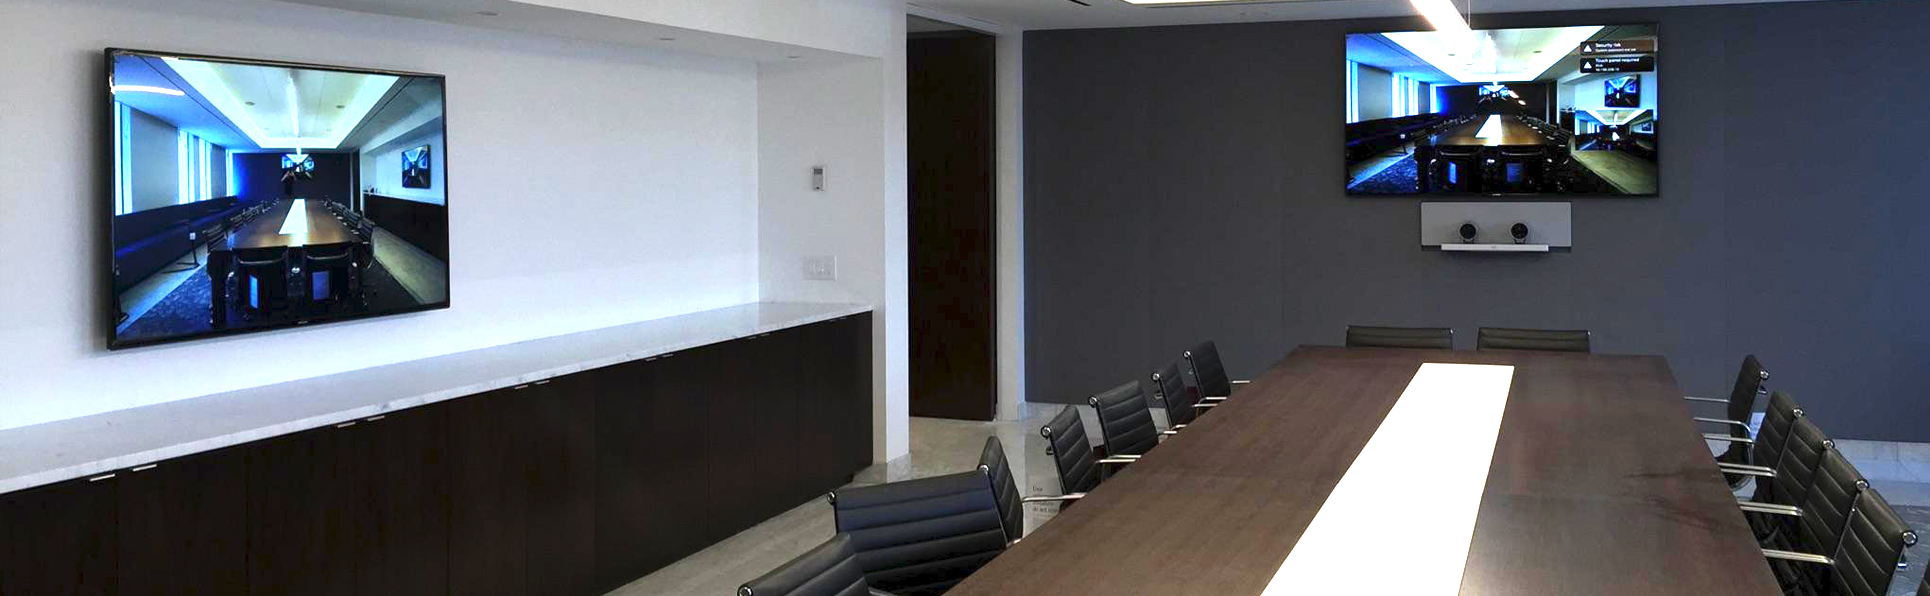 corporate boardroom systems